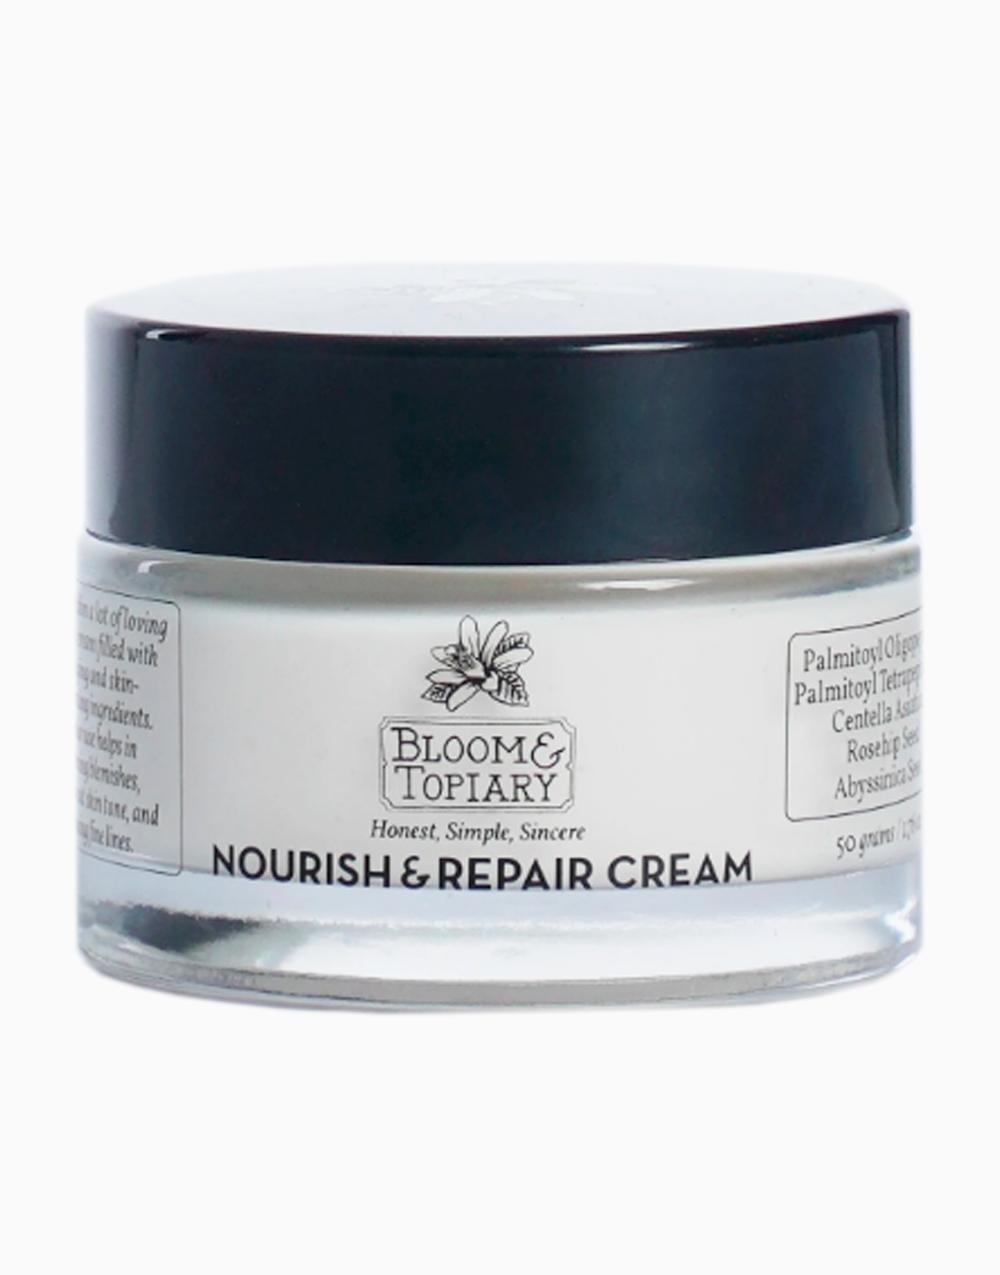 Nourish & Repair Cream by Bloom & Topiary